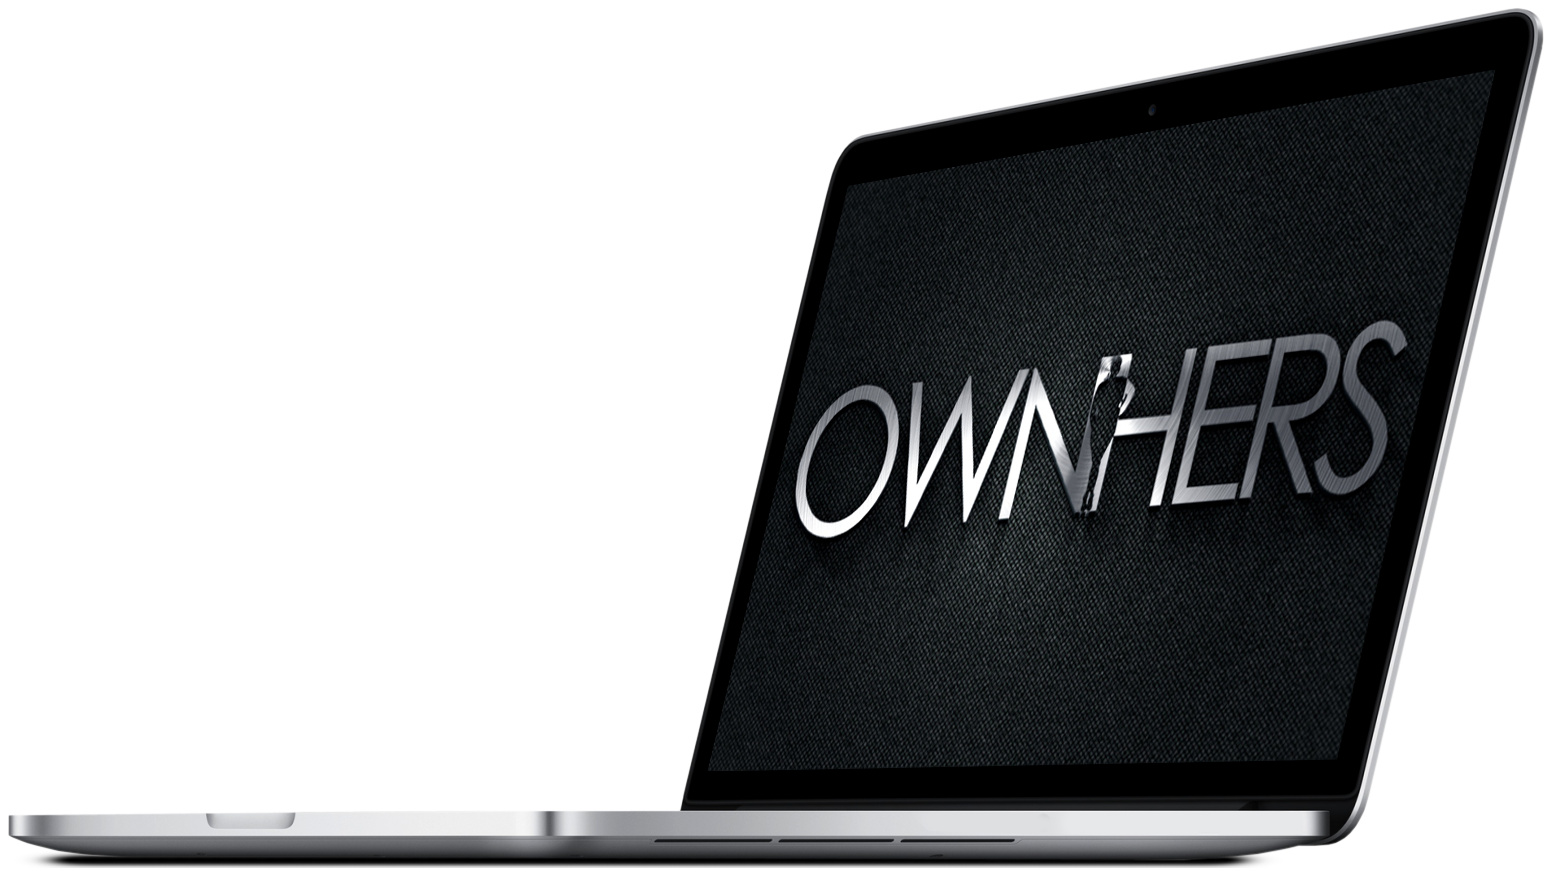 3D OwnHers on laptop.jpg